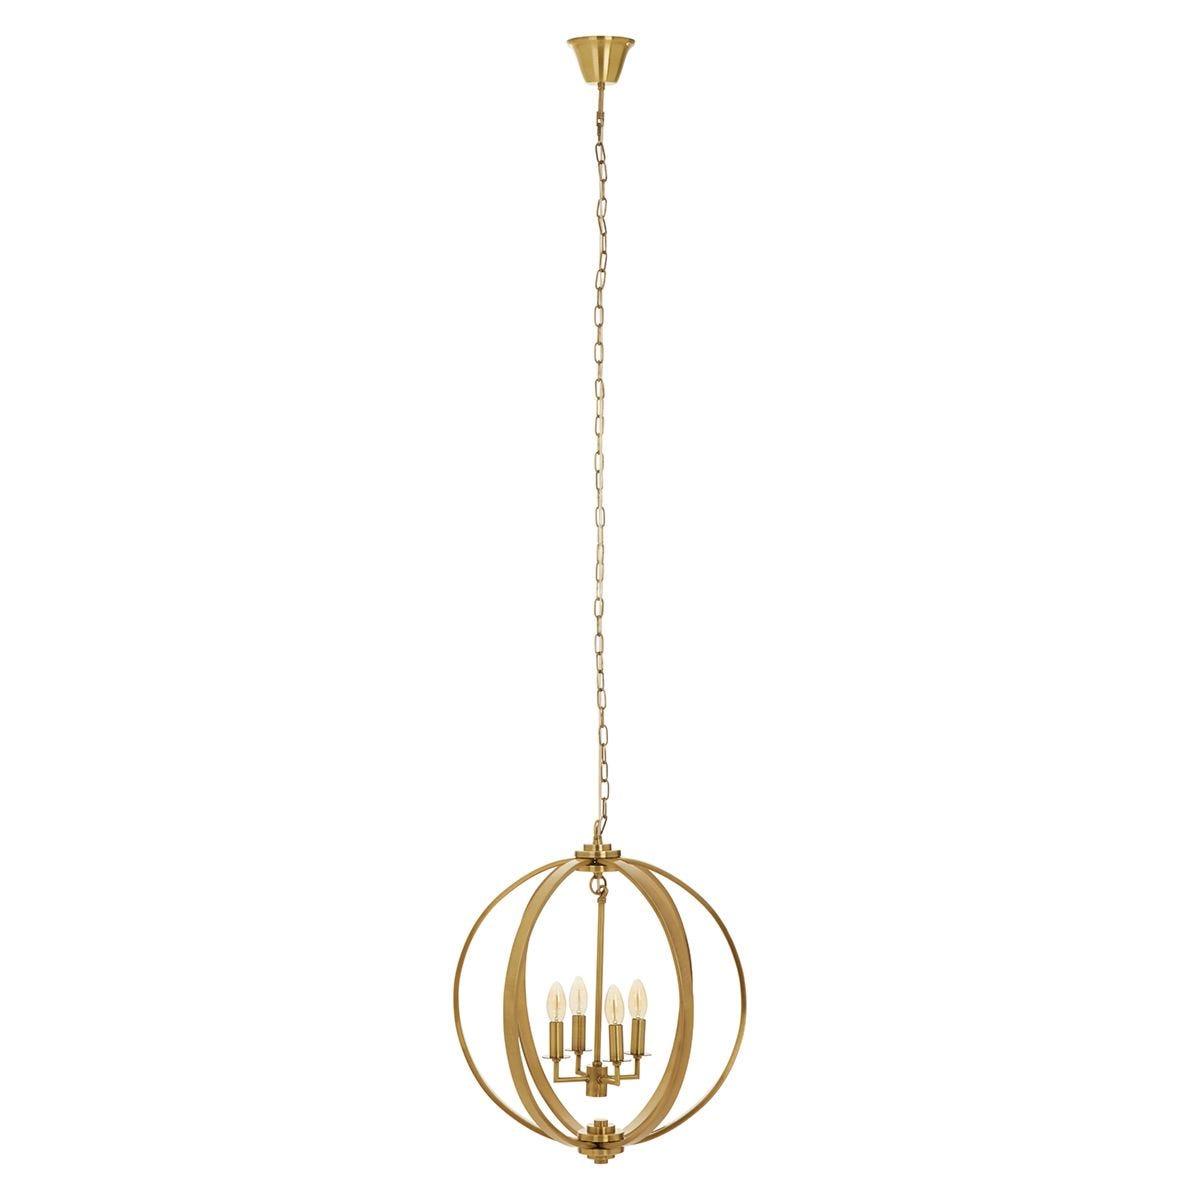 Premier Housewares Censer Pendant Lamp - Antique Brass Finish